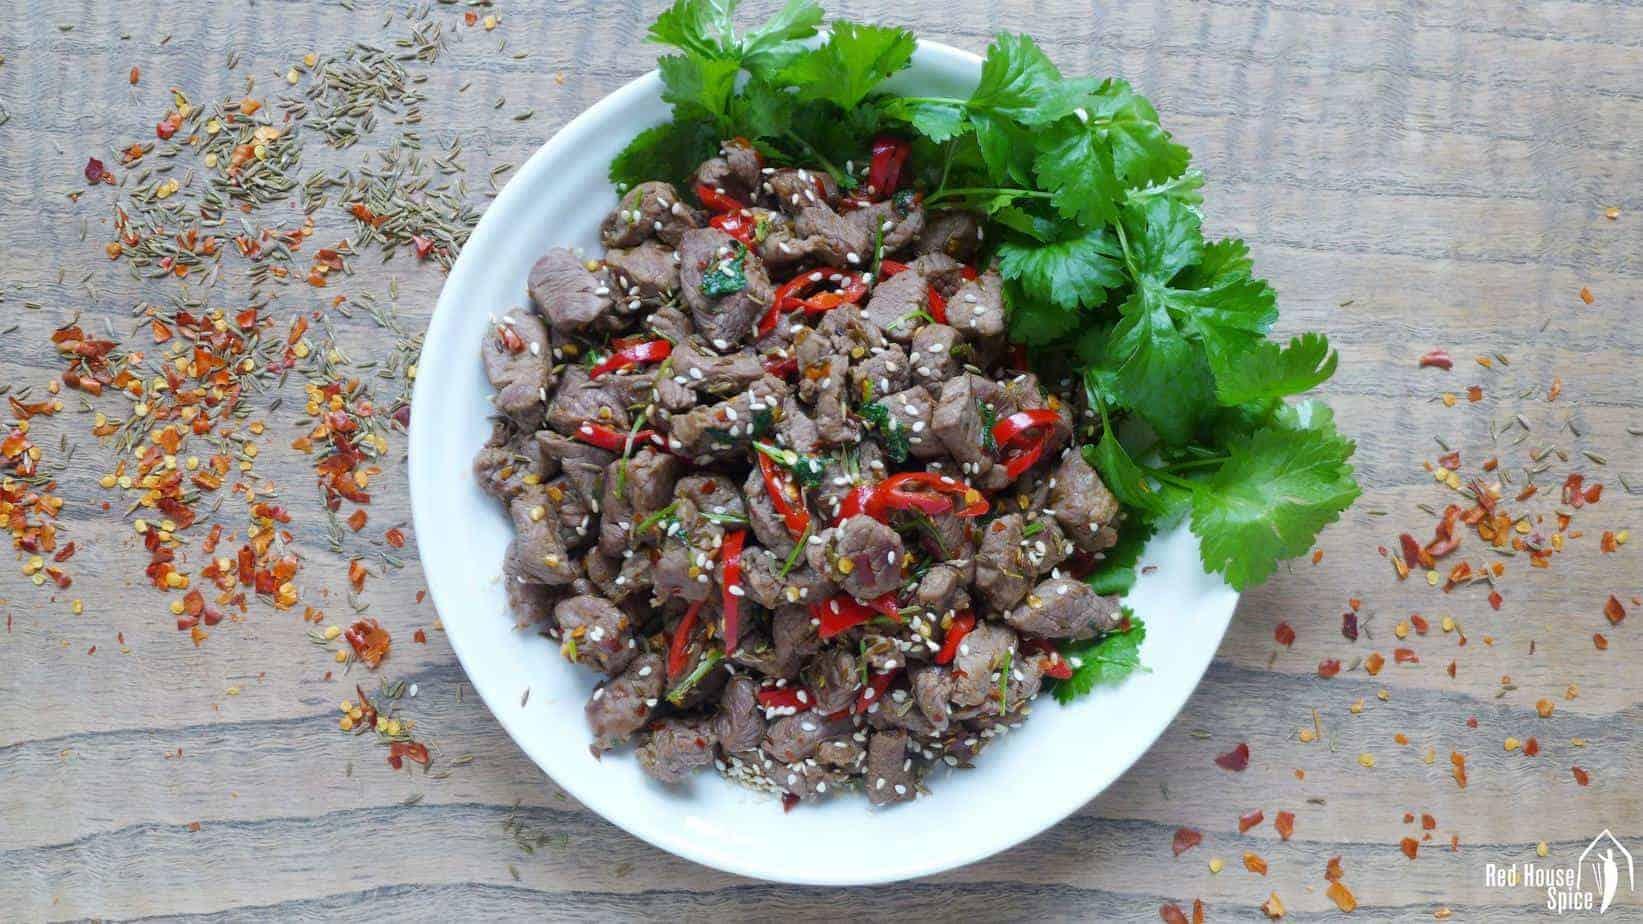 Spicy cumin lamb stir-fry (孜然羊肉)